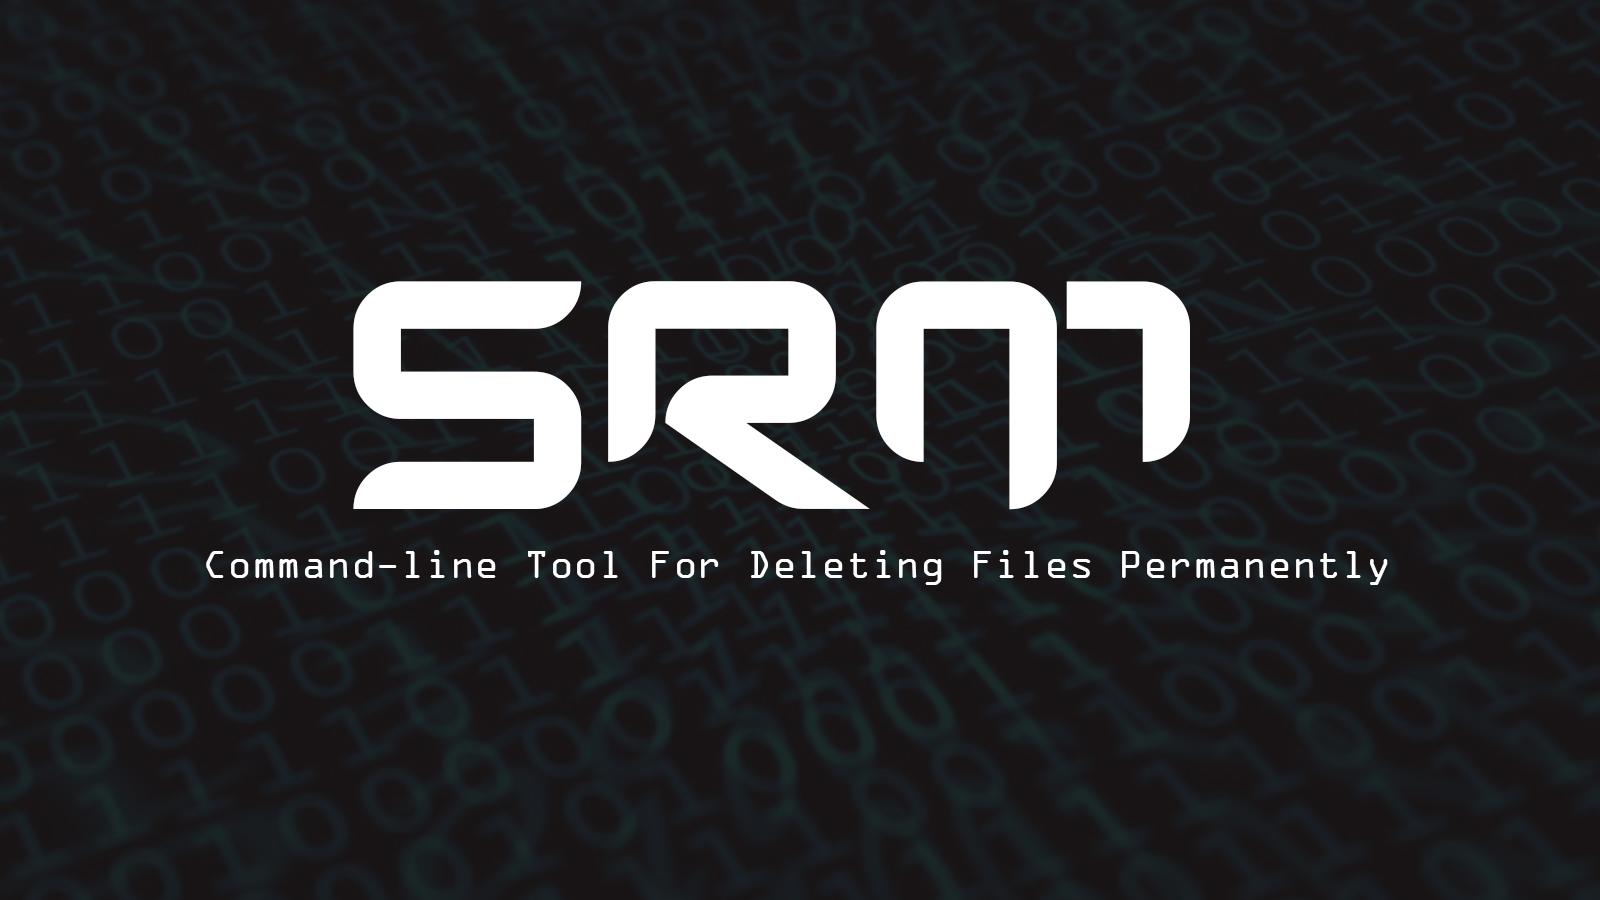 Srm - Command-line Tool